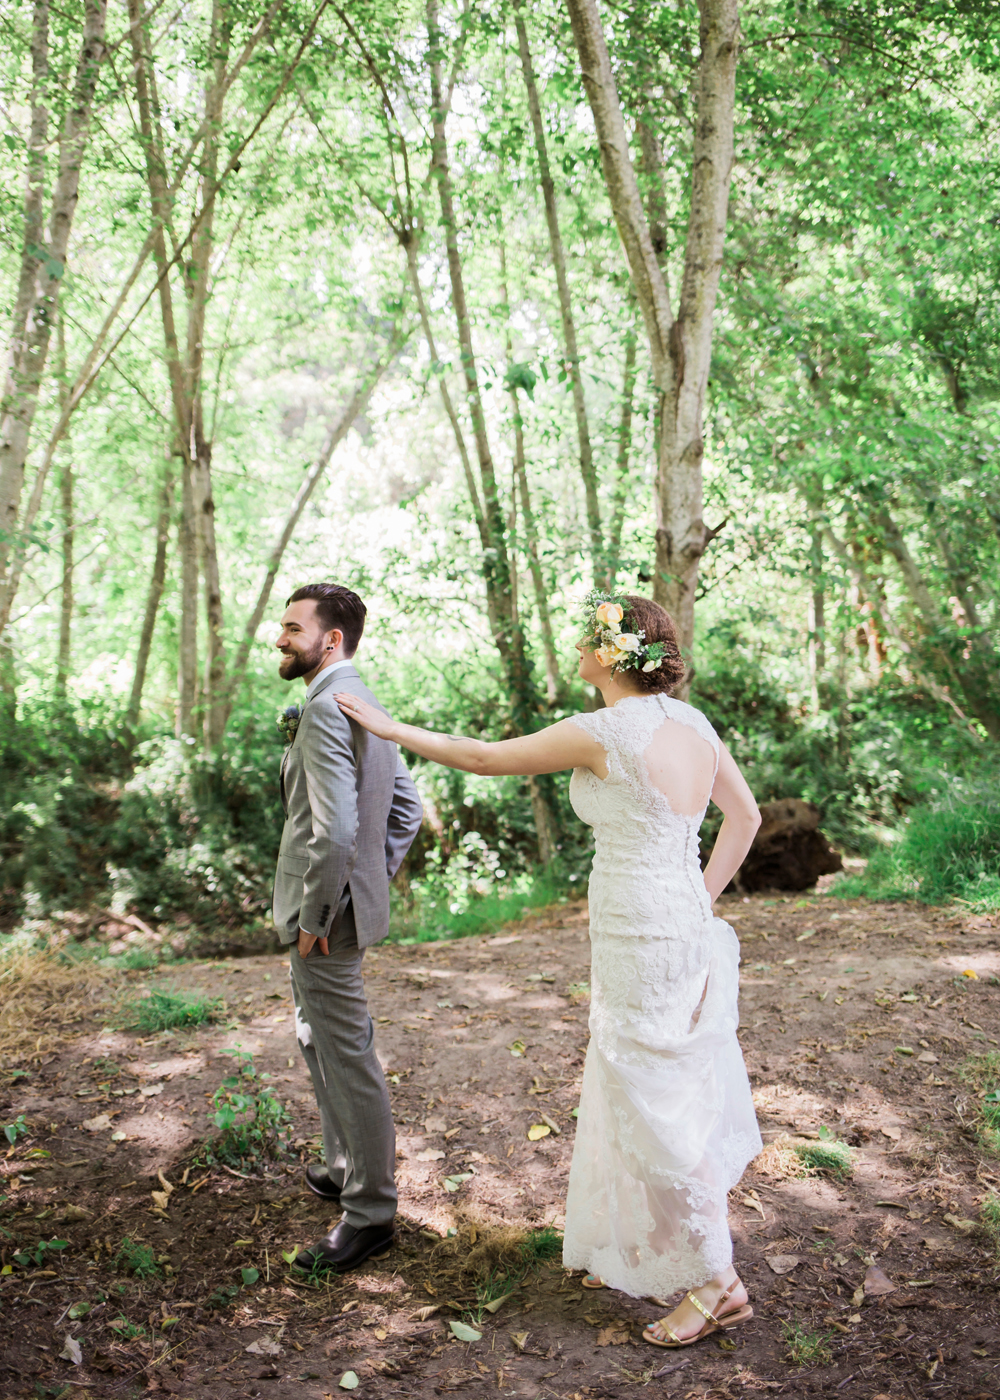 aptos-village-park-wedding-photography-lilouette-02.jpg